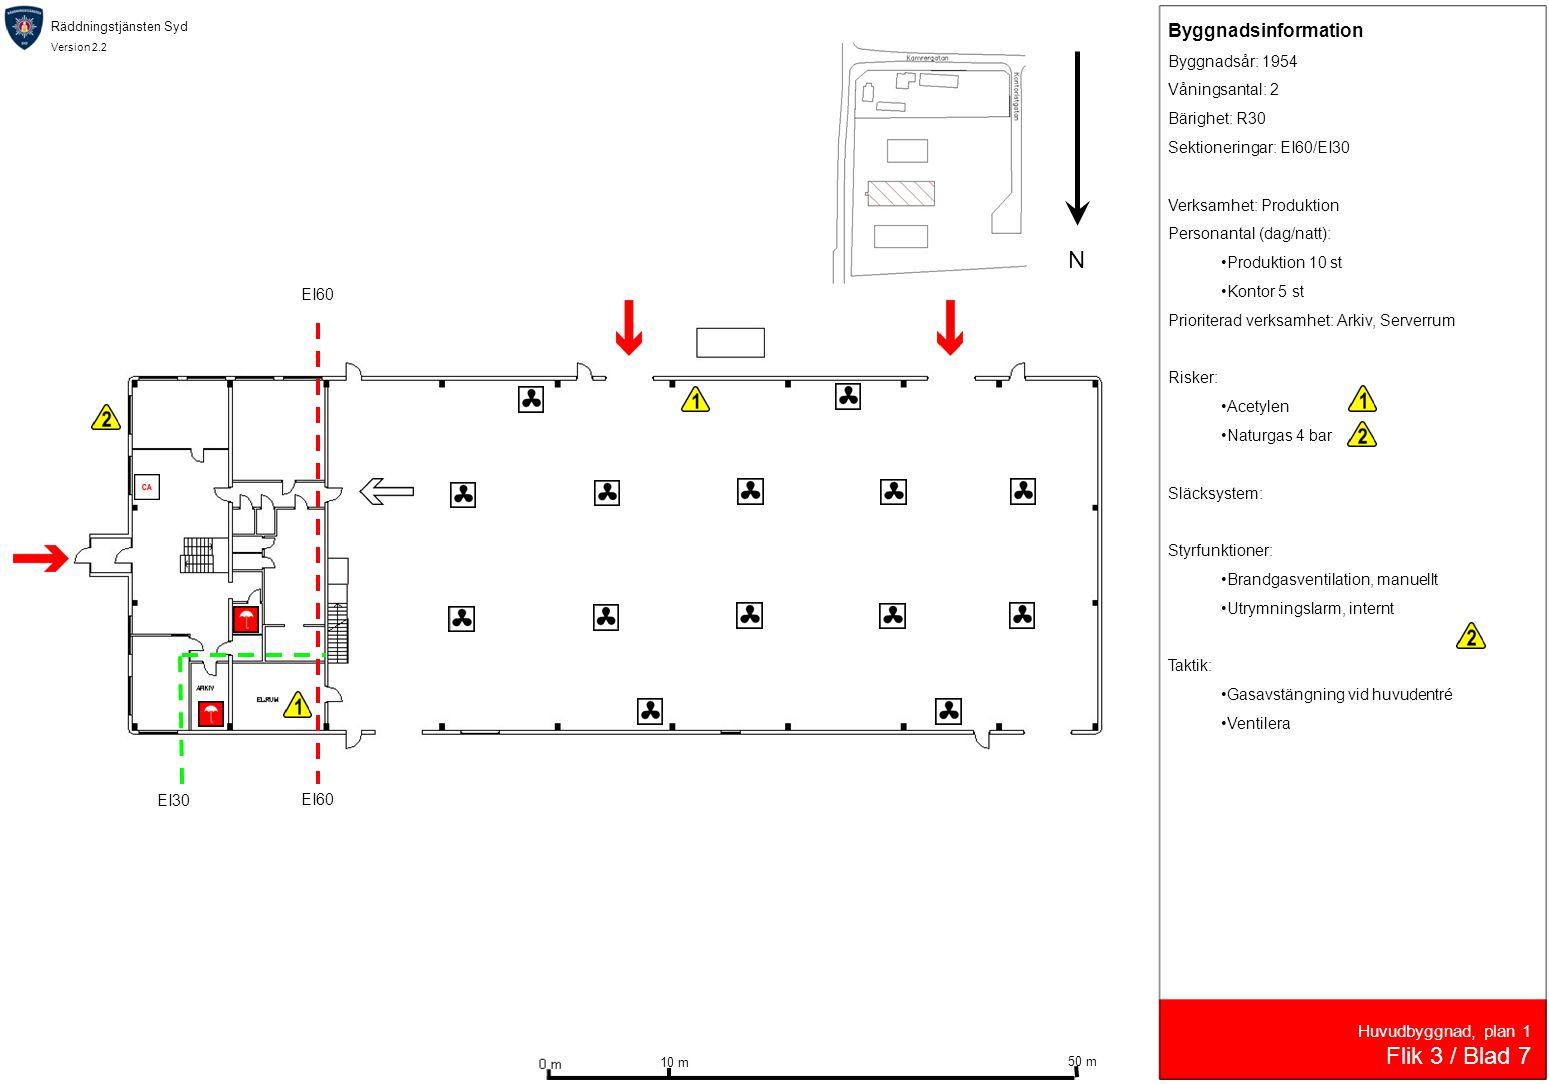 N Flik 3 / Blad 7 Byggnadsinformation Huvudbyggnad, plan 1